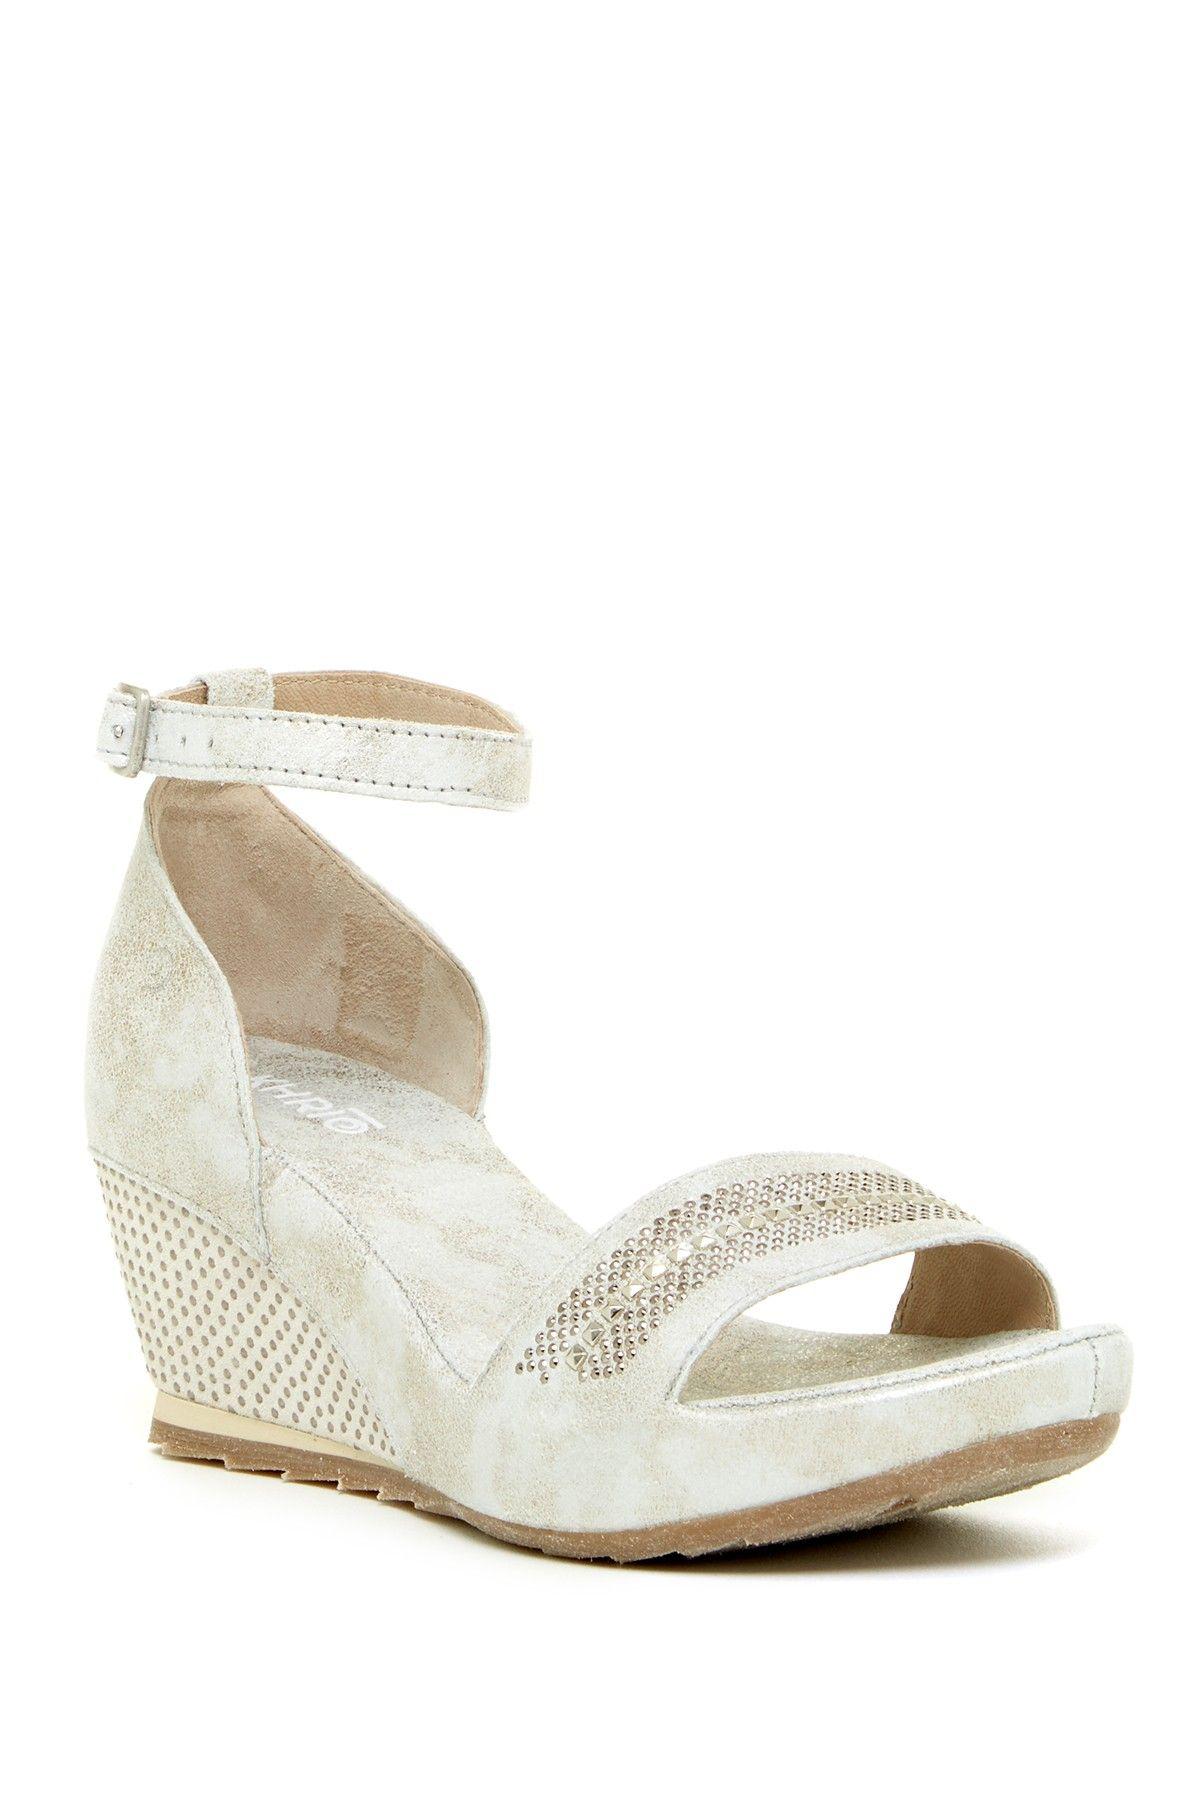 Khrio Studded Wedge Sandal ch8W6G